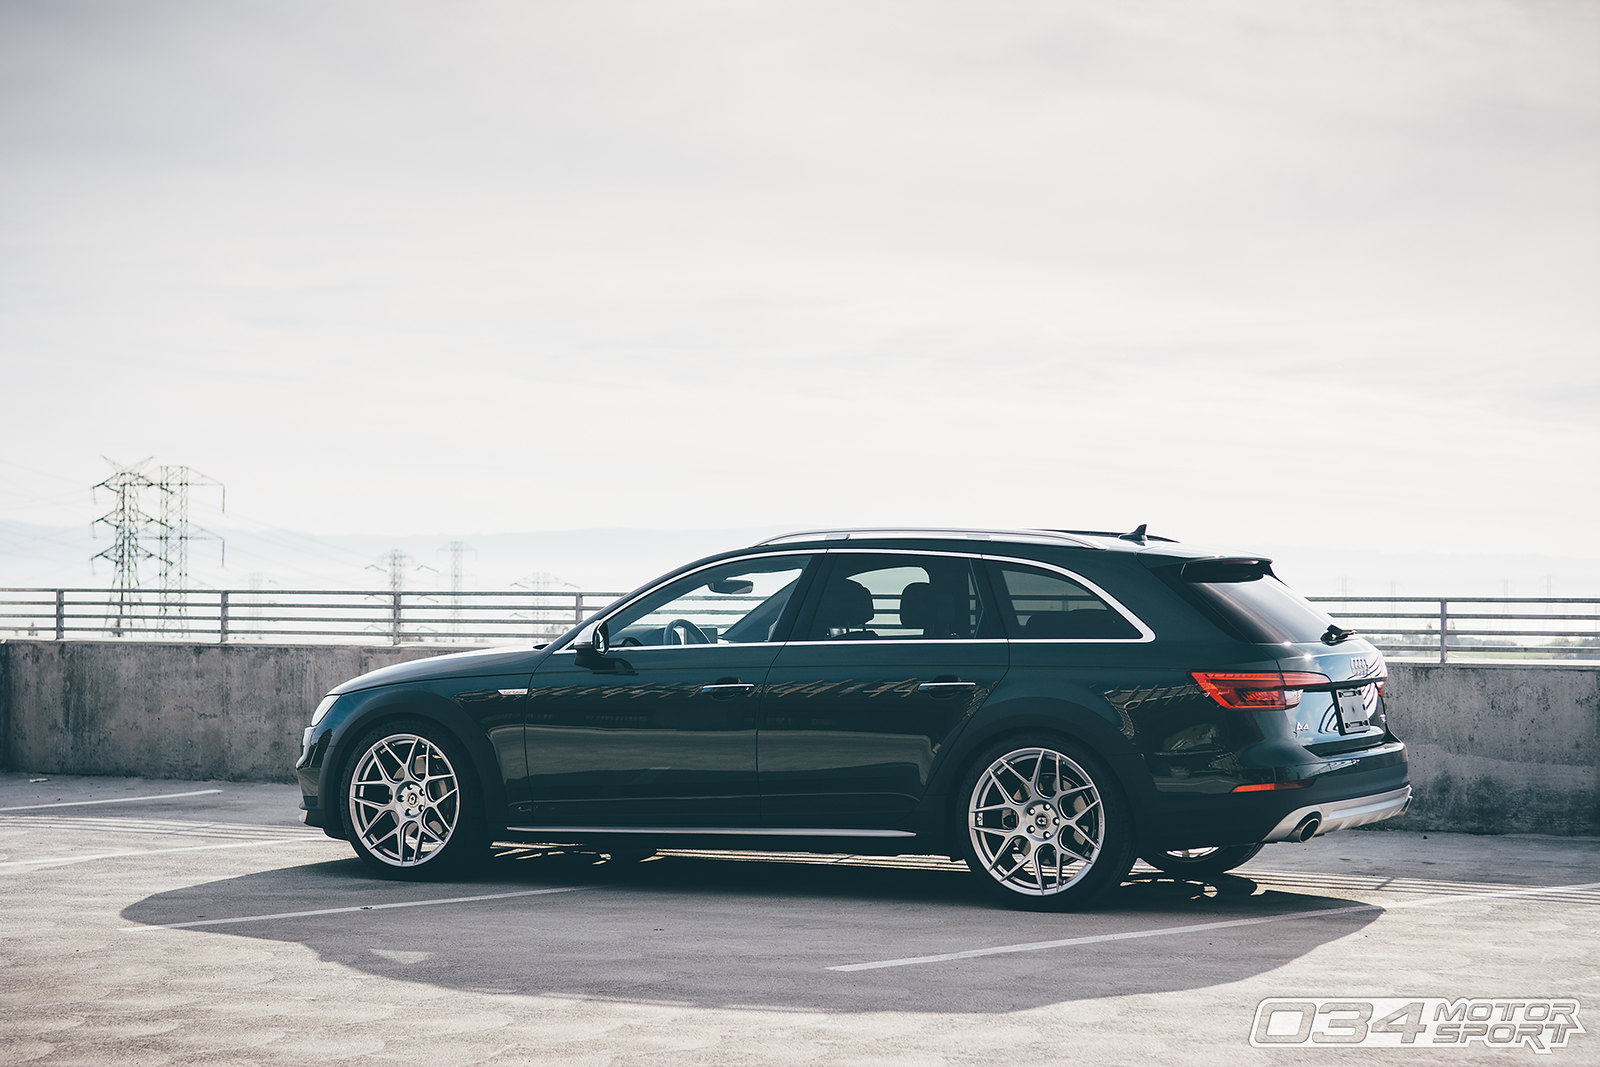 Gotland Green: The 034Motorsport Touch - AudiWorld Forums